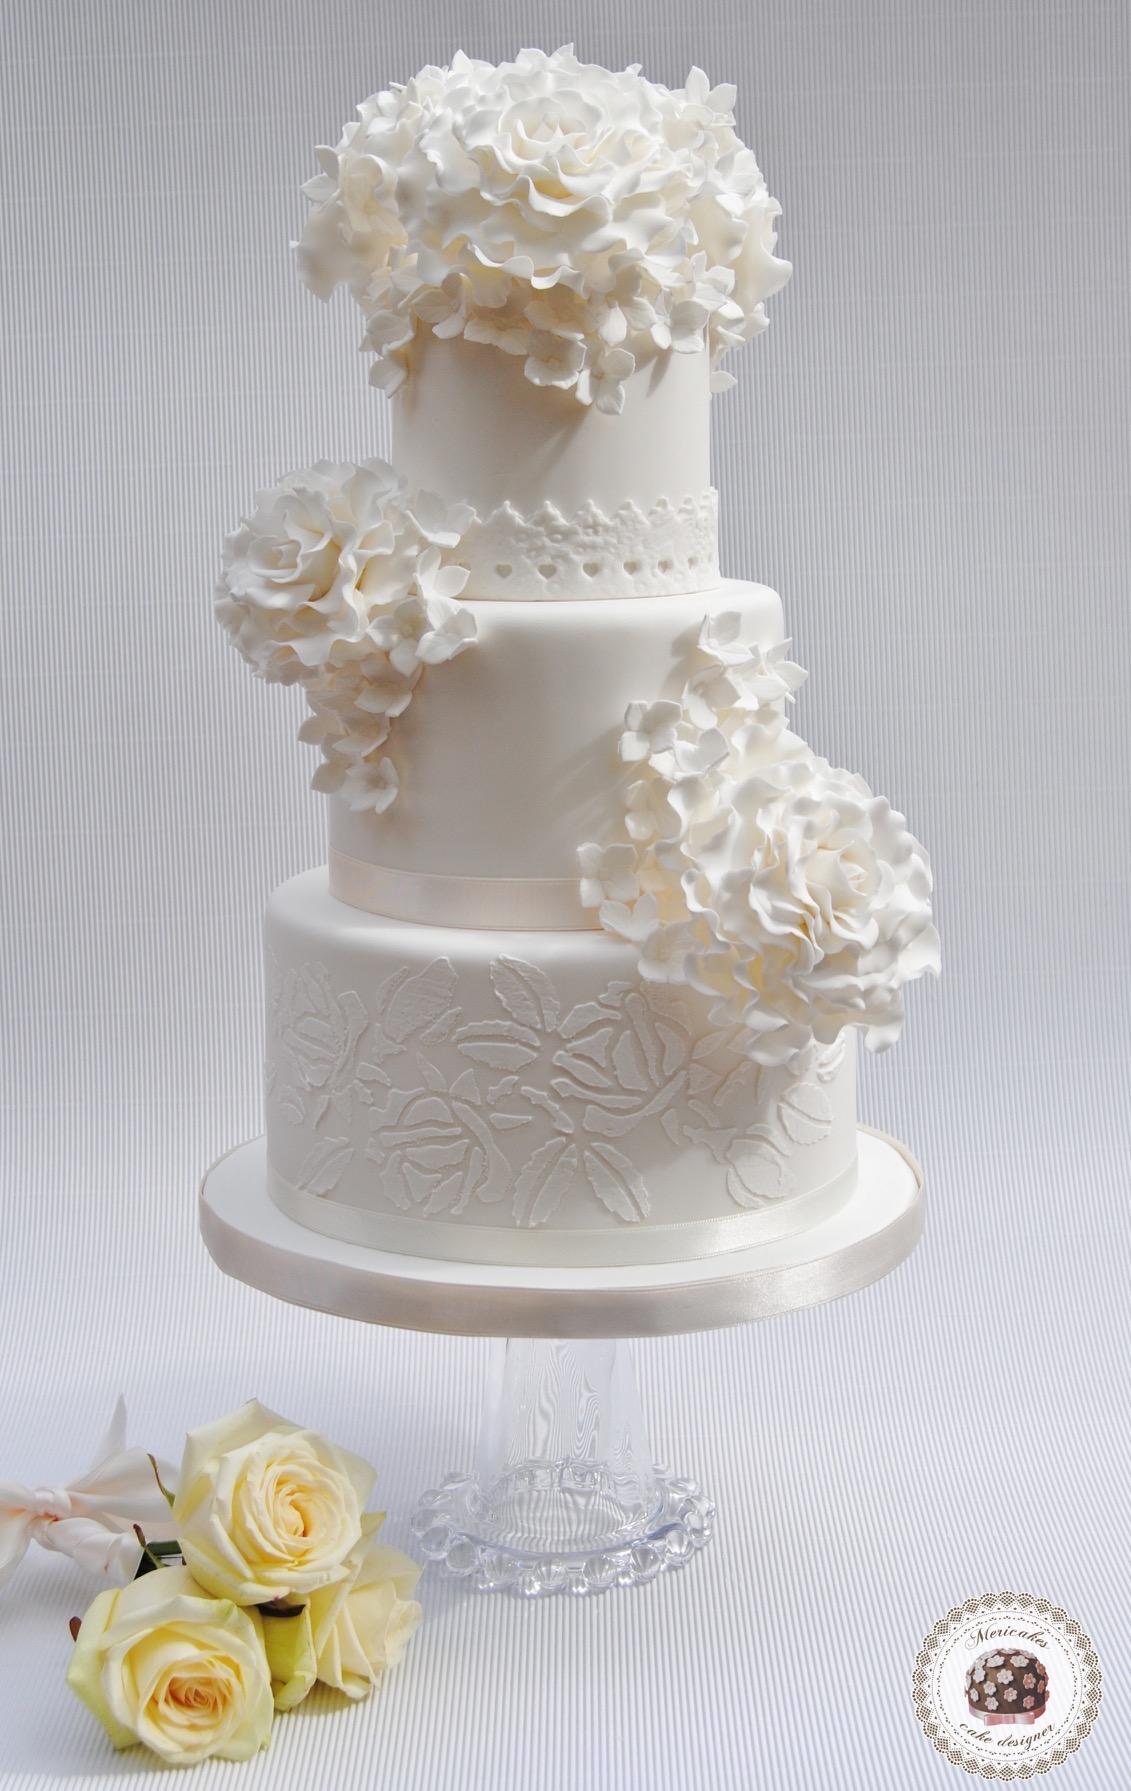 mericakes-tarta-de-boda-wedding-cake-tartas-decoradas-tartas-barcelona-pastel-fondant-rosas-flores-de-azucar-sugarflowers-sugarcraft-boda-spain-weddings-1